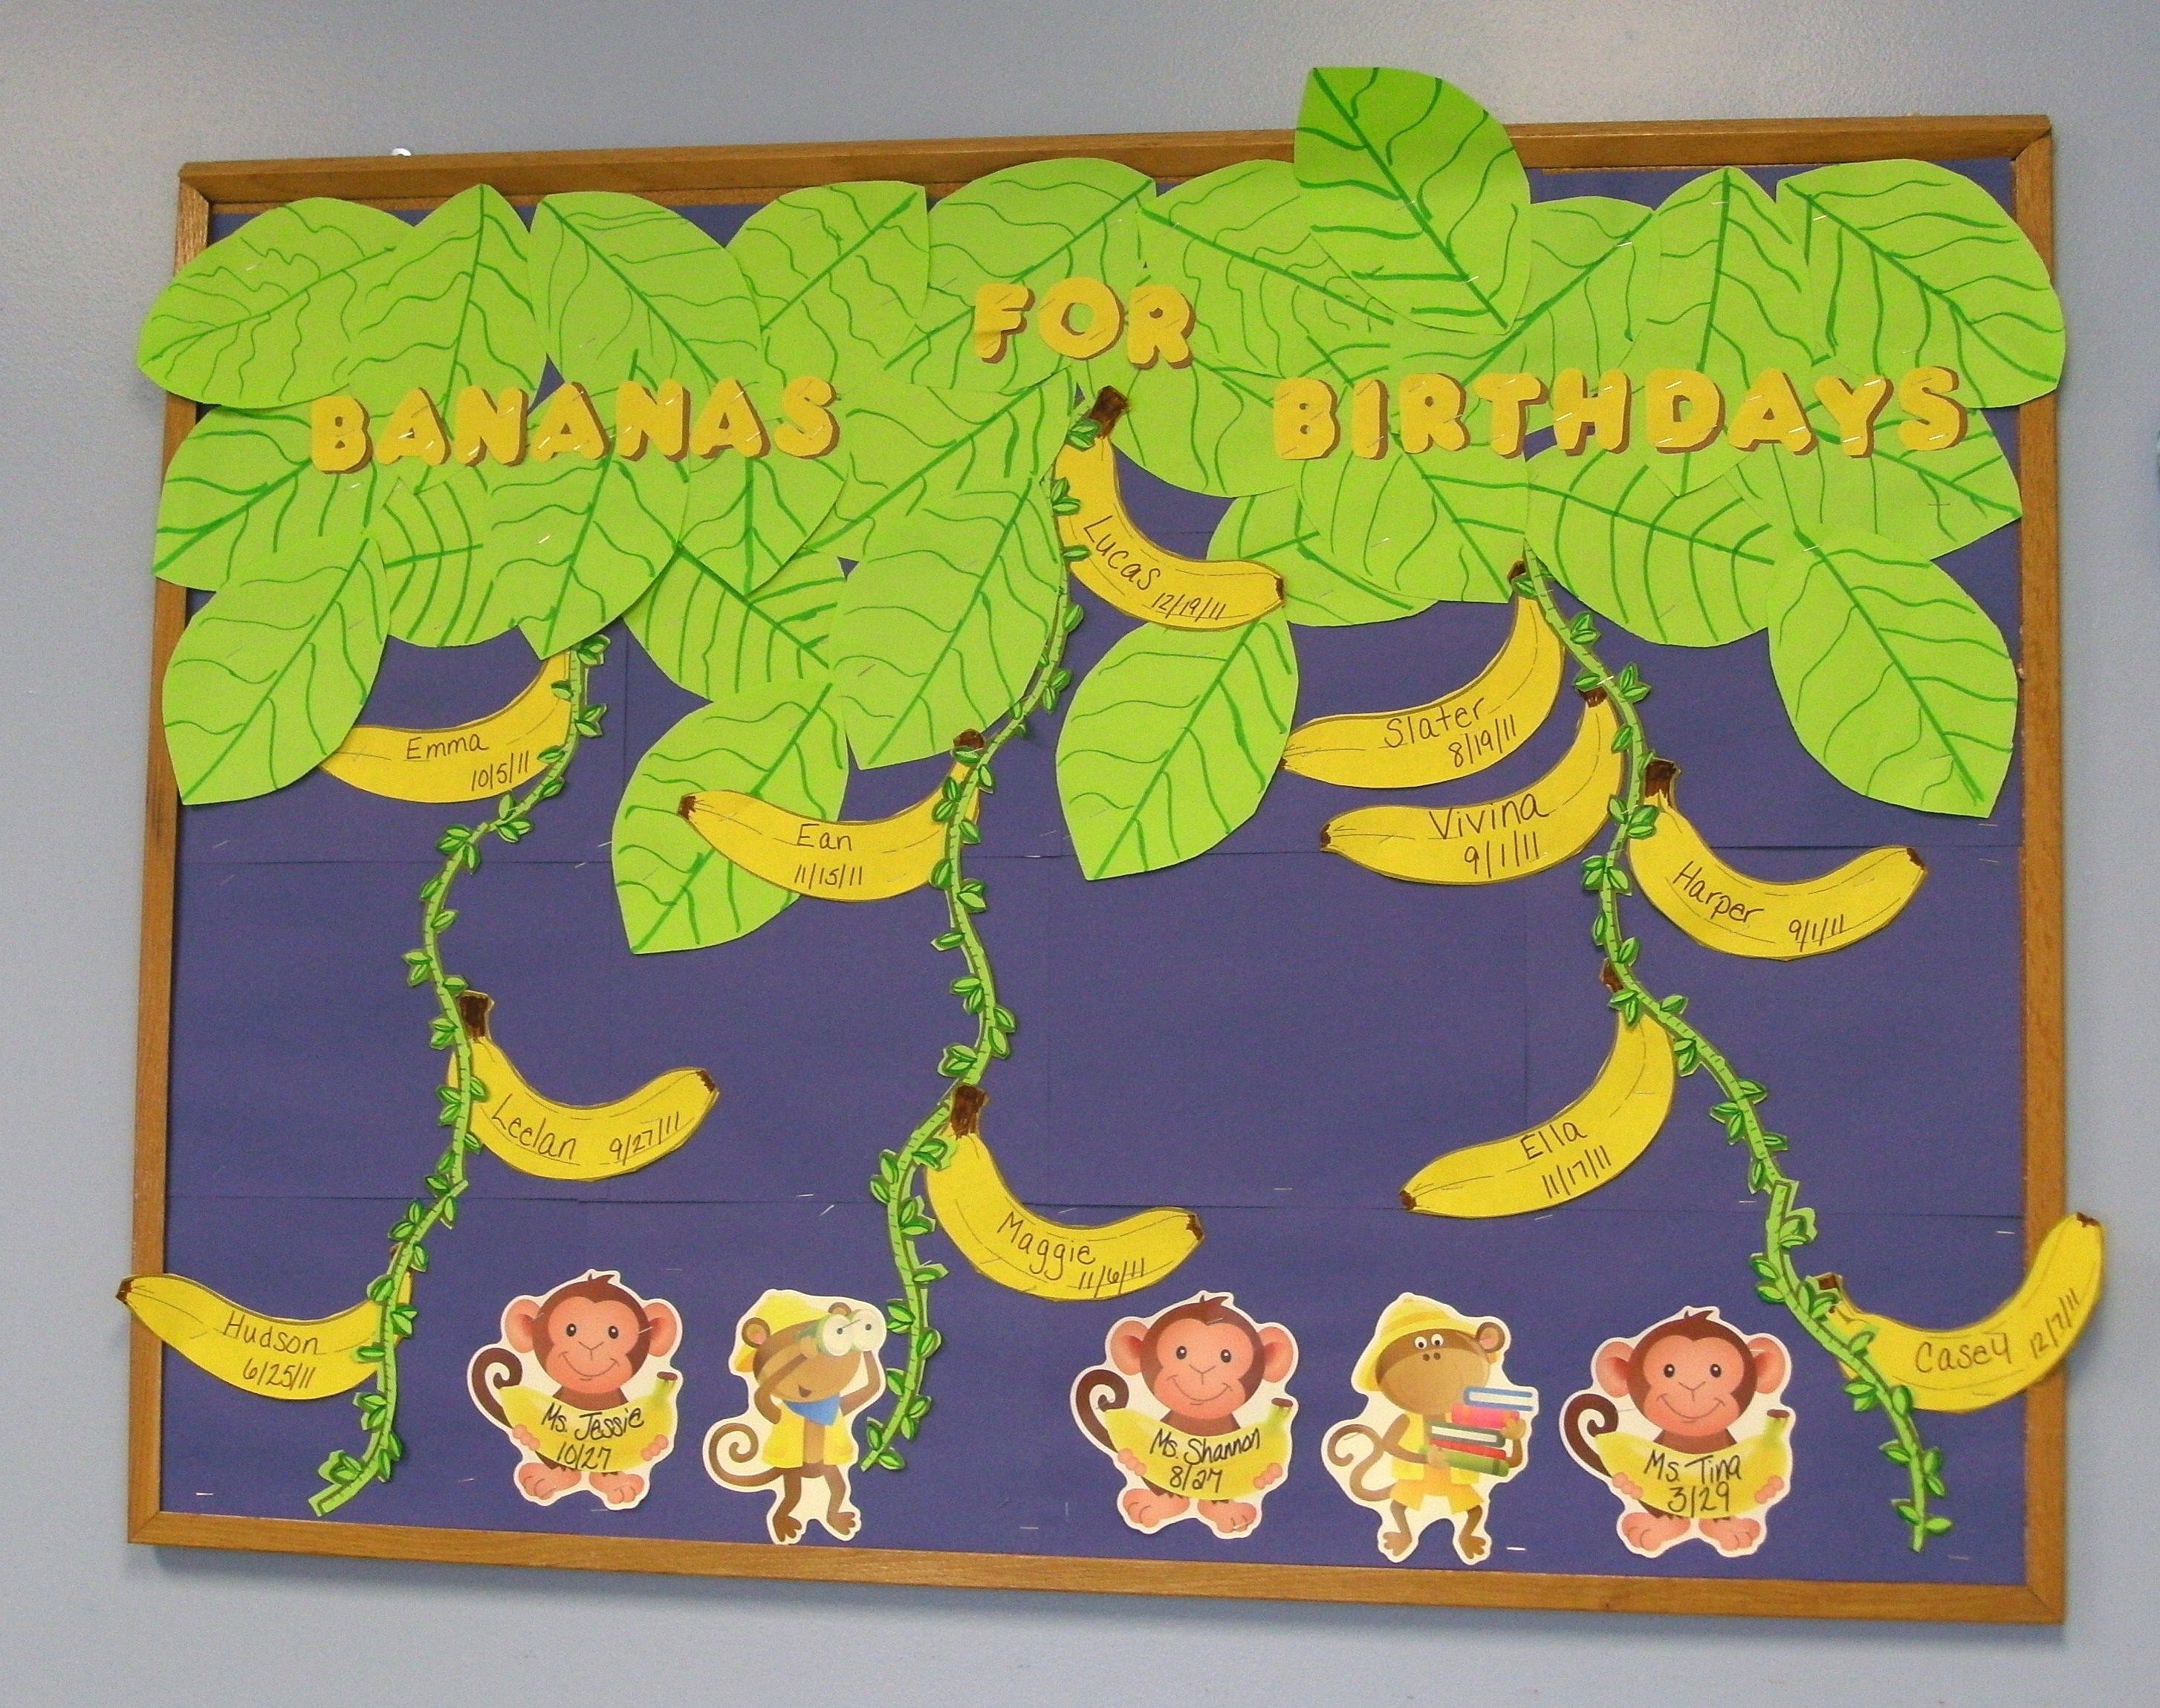 monkey bananas birthday board bulletin boards pinterest